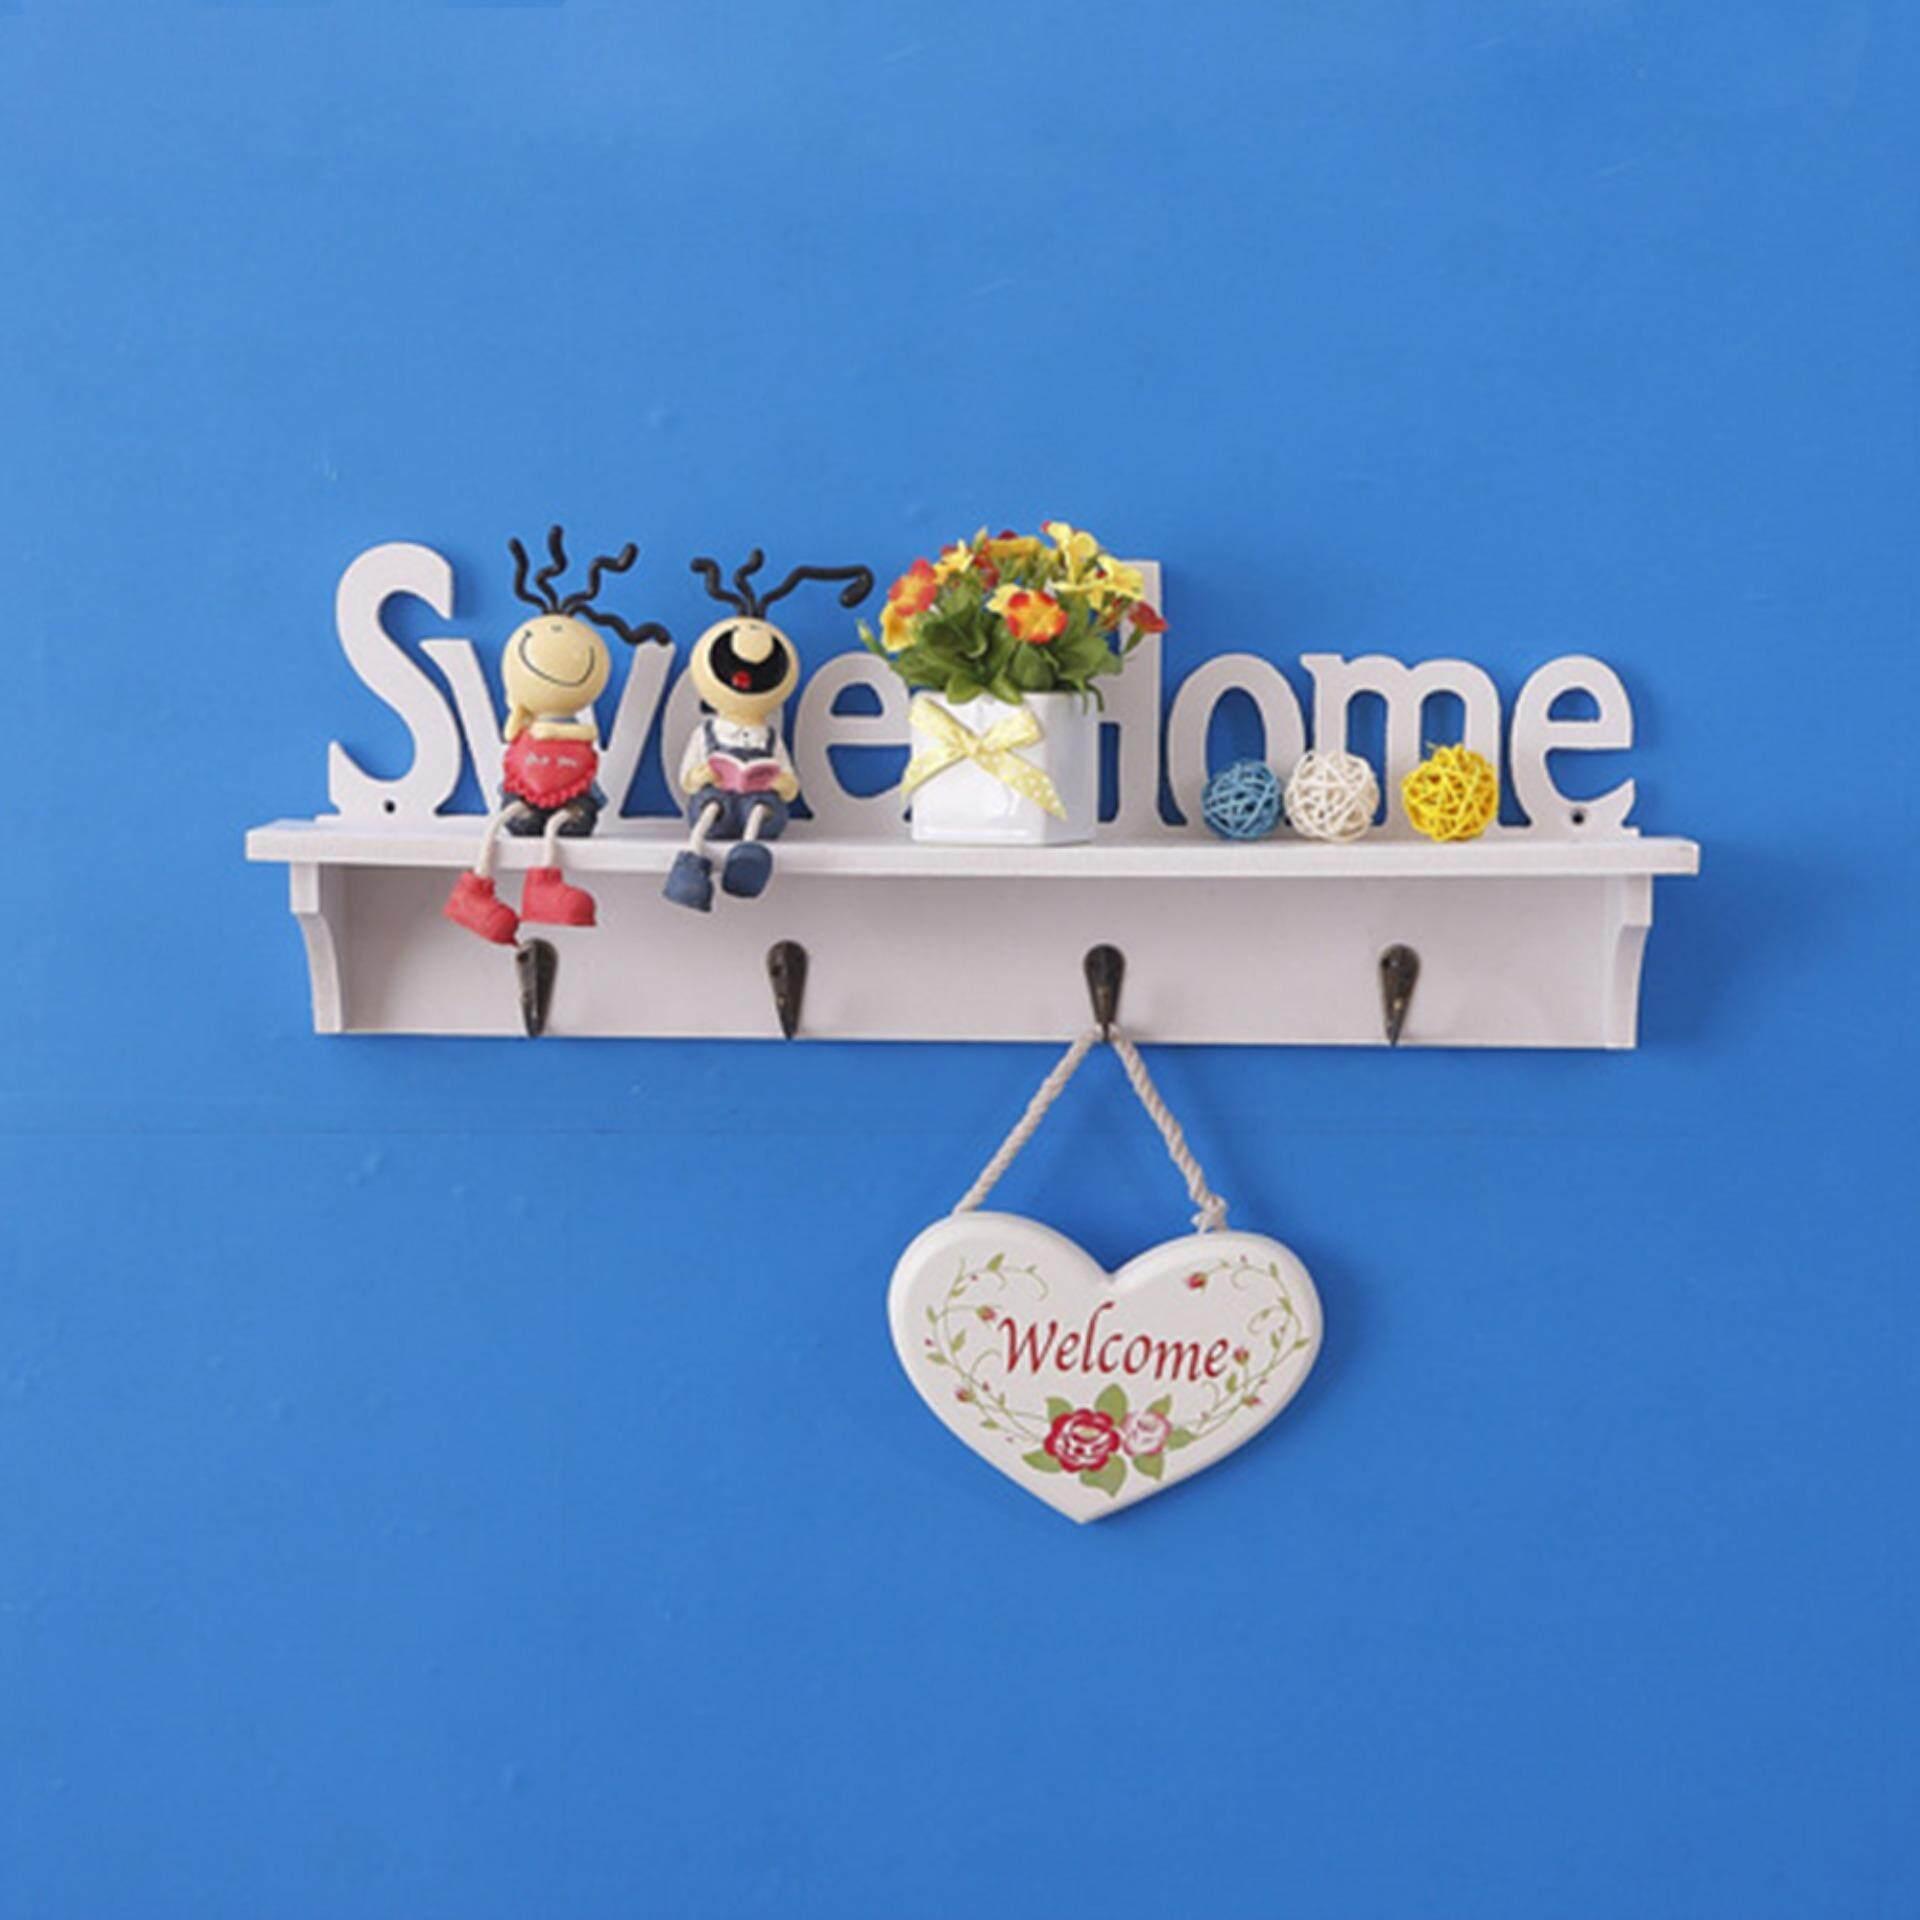 GETEK Sweet Home Wall Decorative Clothes Hook Rack Wall Mounted Carved Shelves Key Storage Hanging Holders